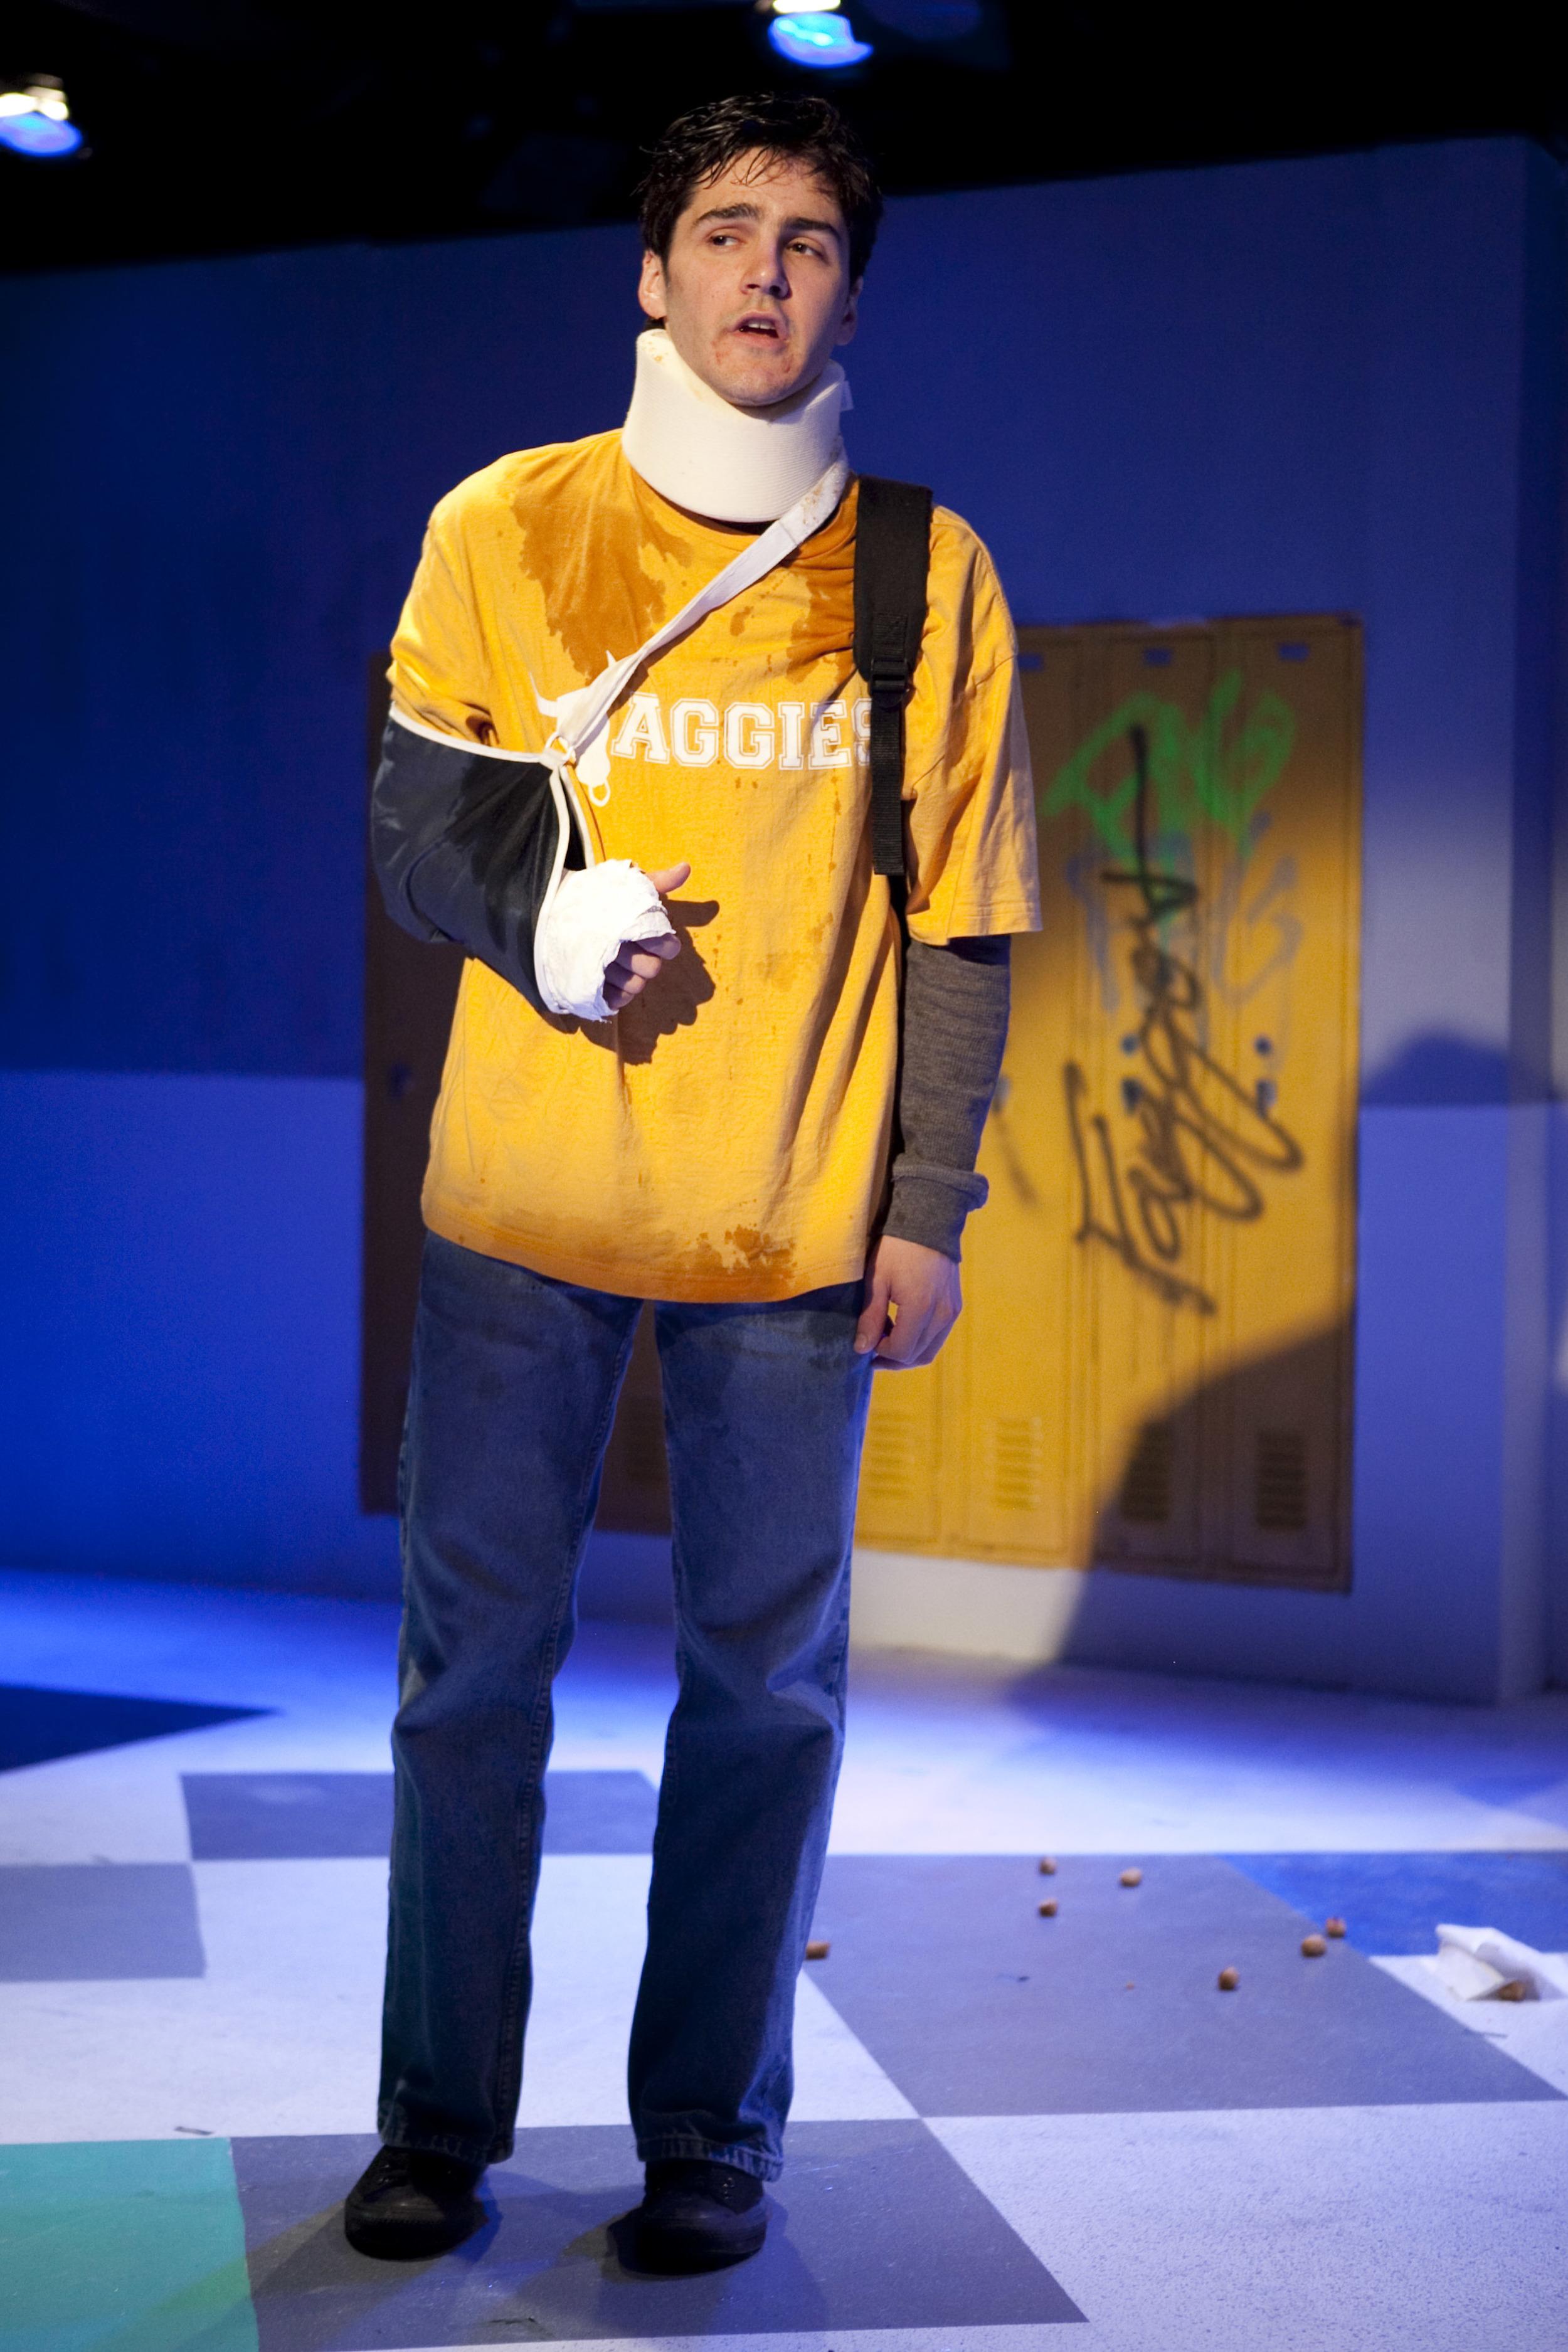 David Rosenblatt as 'The Kid'. (Photo by Chasi Annexy)